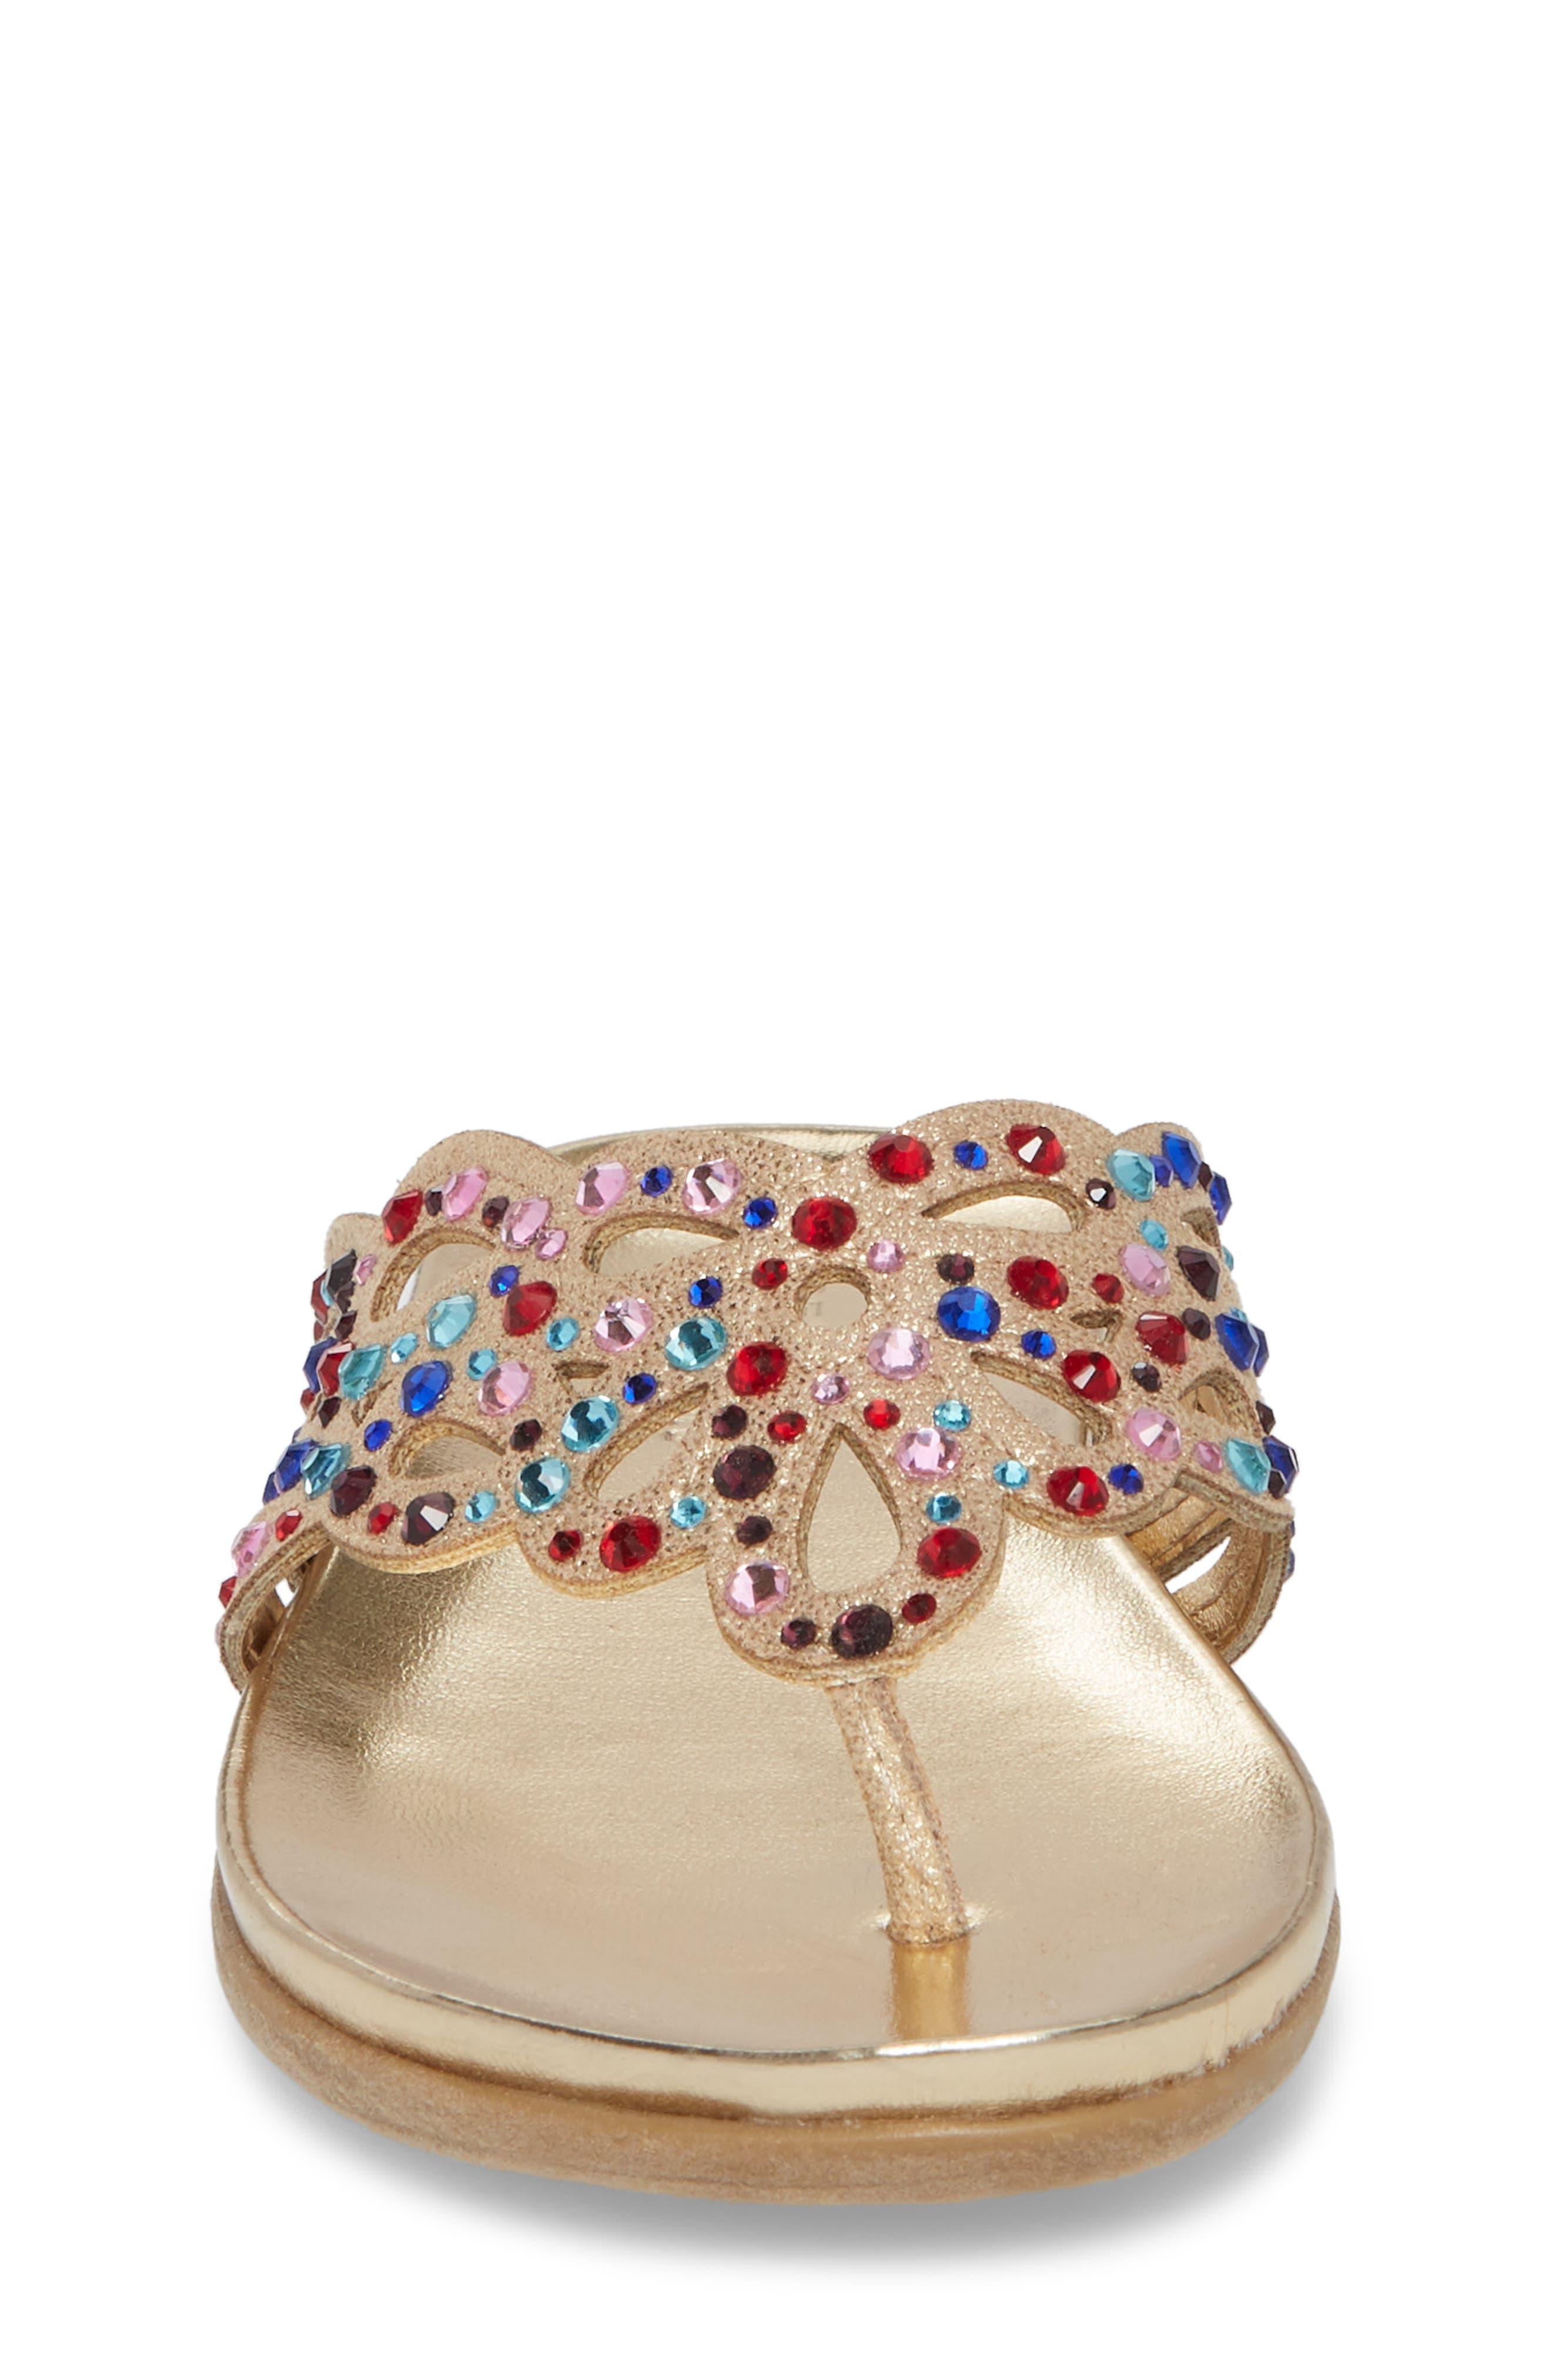 Kenneth Cole New York Flutter Metallic Crystal Thong Sandal,                             Alternate thumbnail 4, color,                             Gold Multi